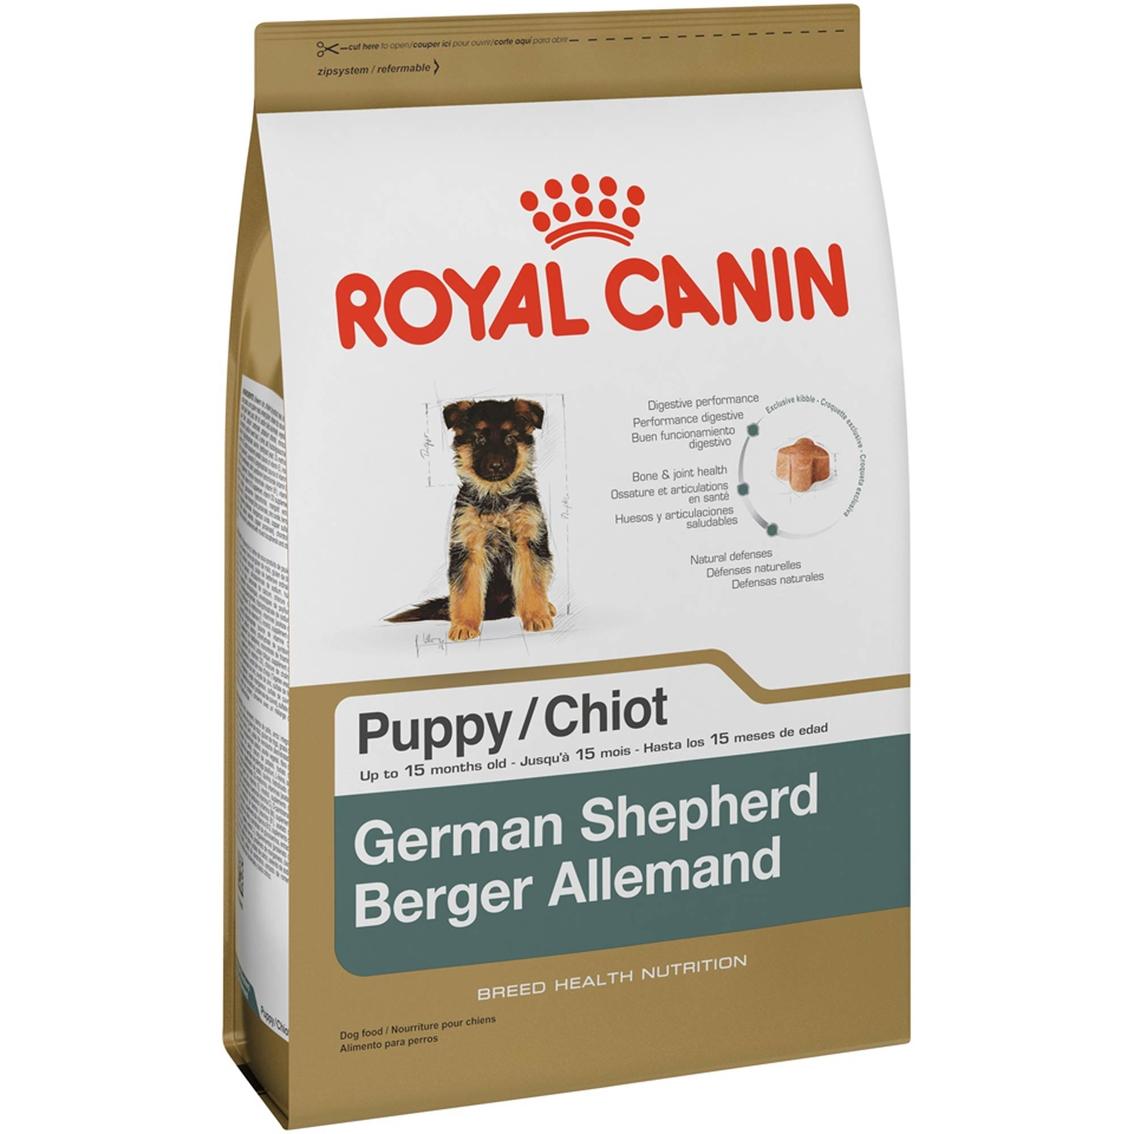 Royal Canin German Shepherd Puppy Food 30 Lb Food Treats Household Shop The Exchange